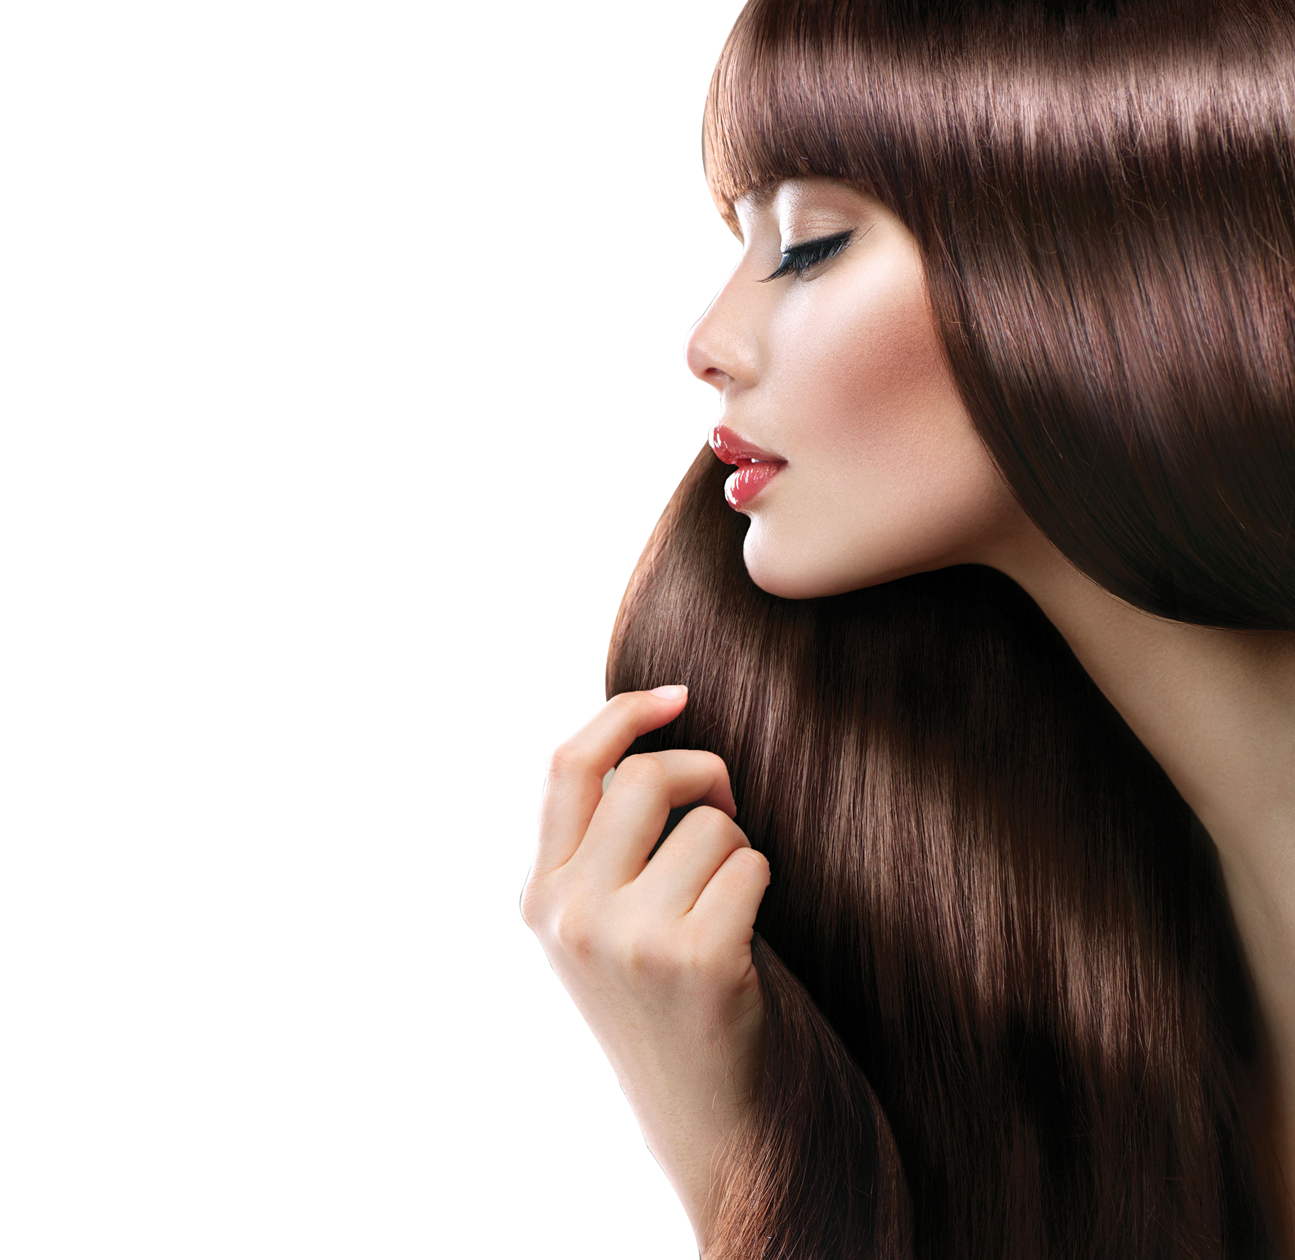 Hair Salon PNG HD Transparent Hair Salon HD.PNG Images..